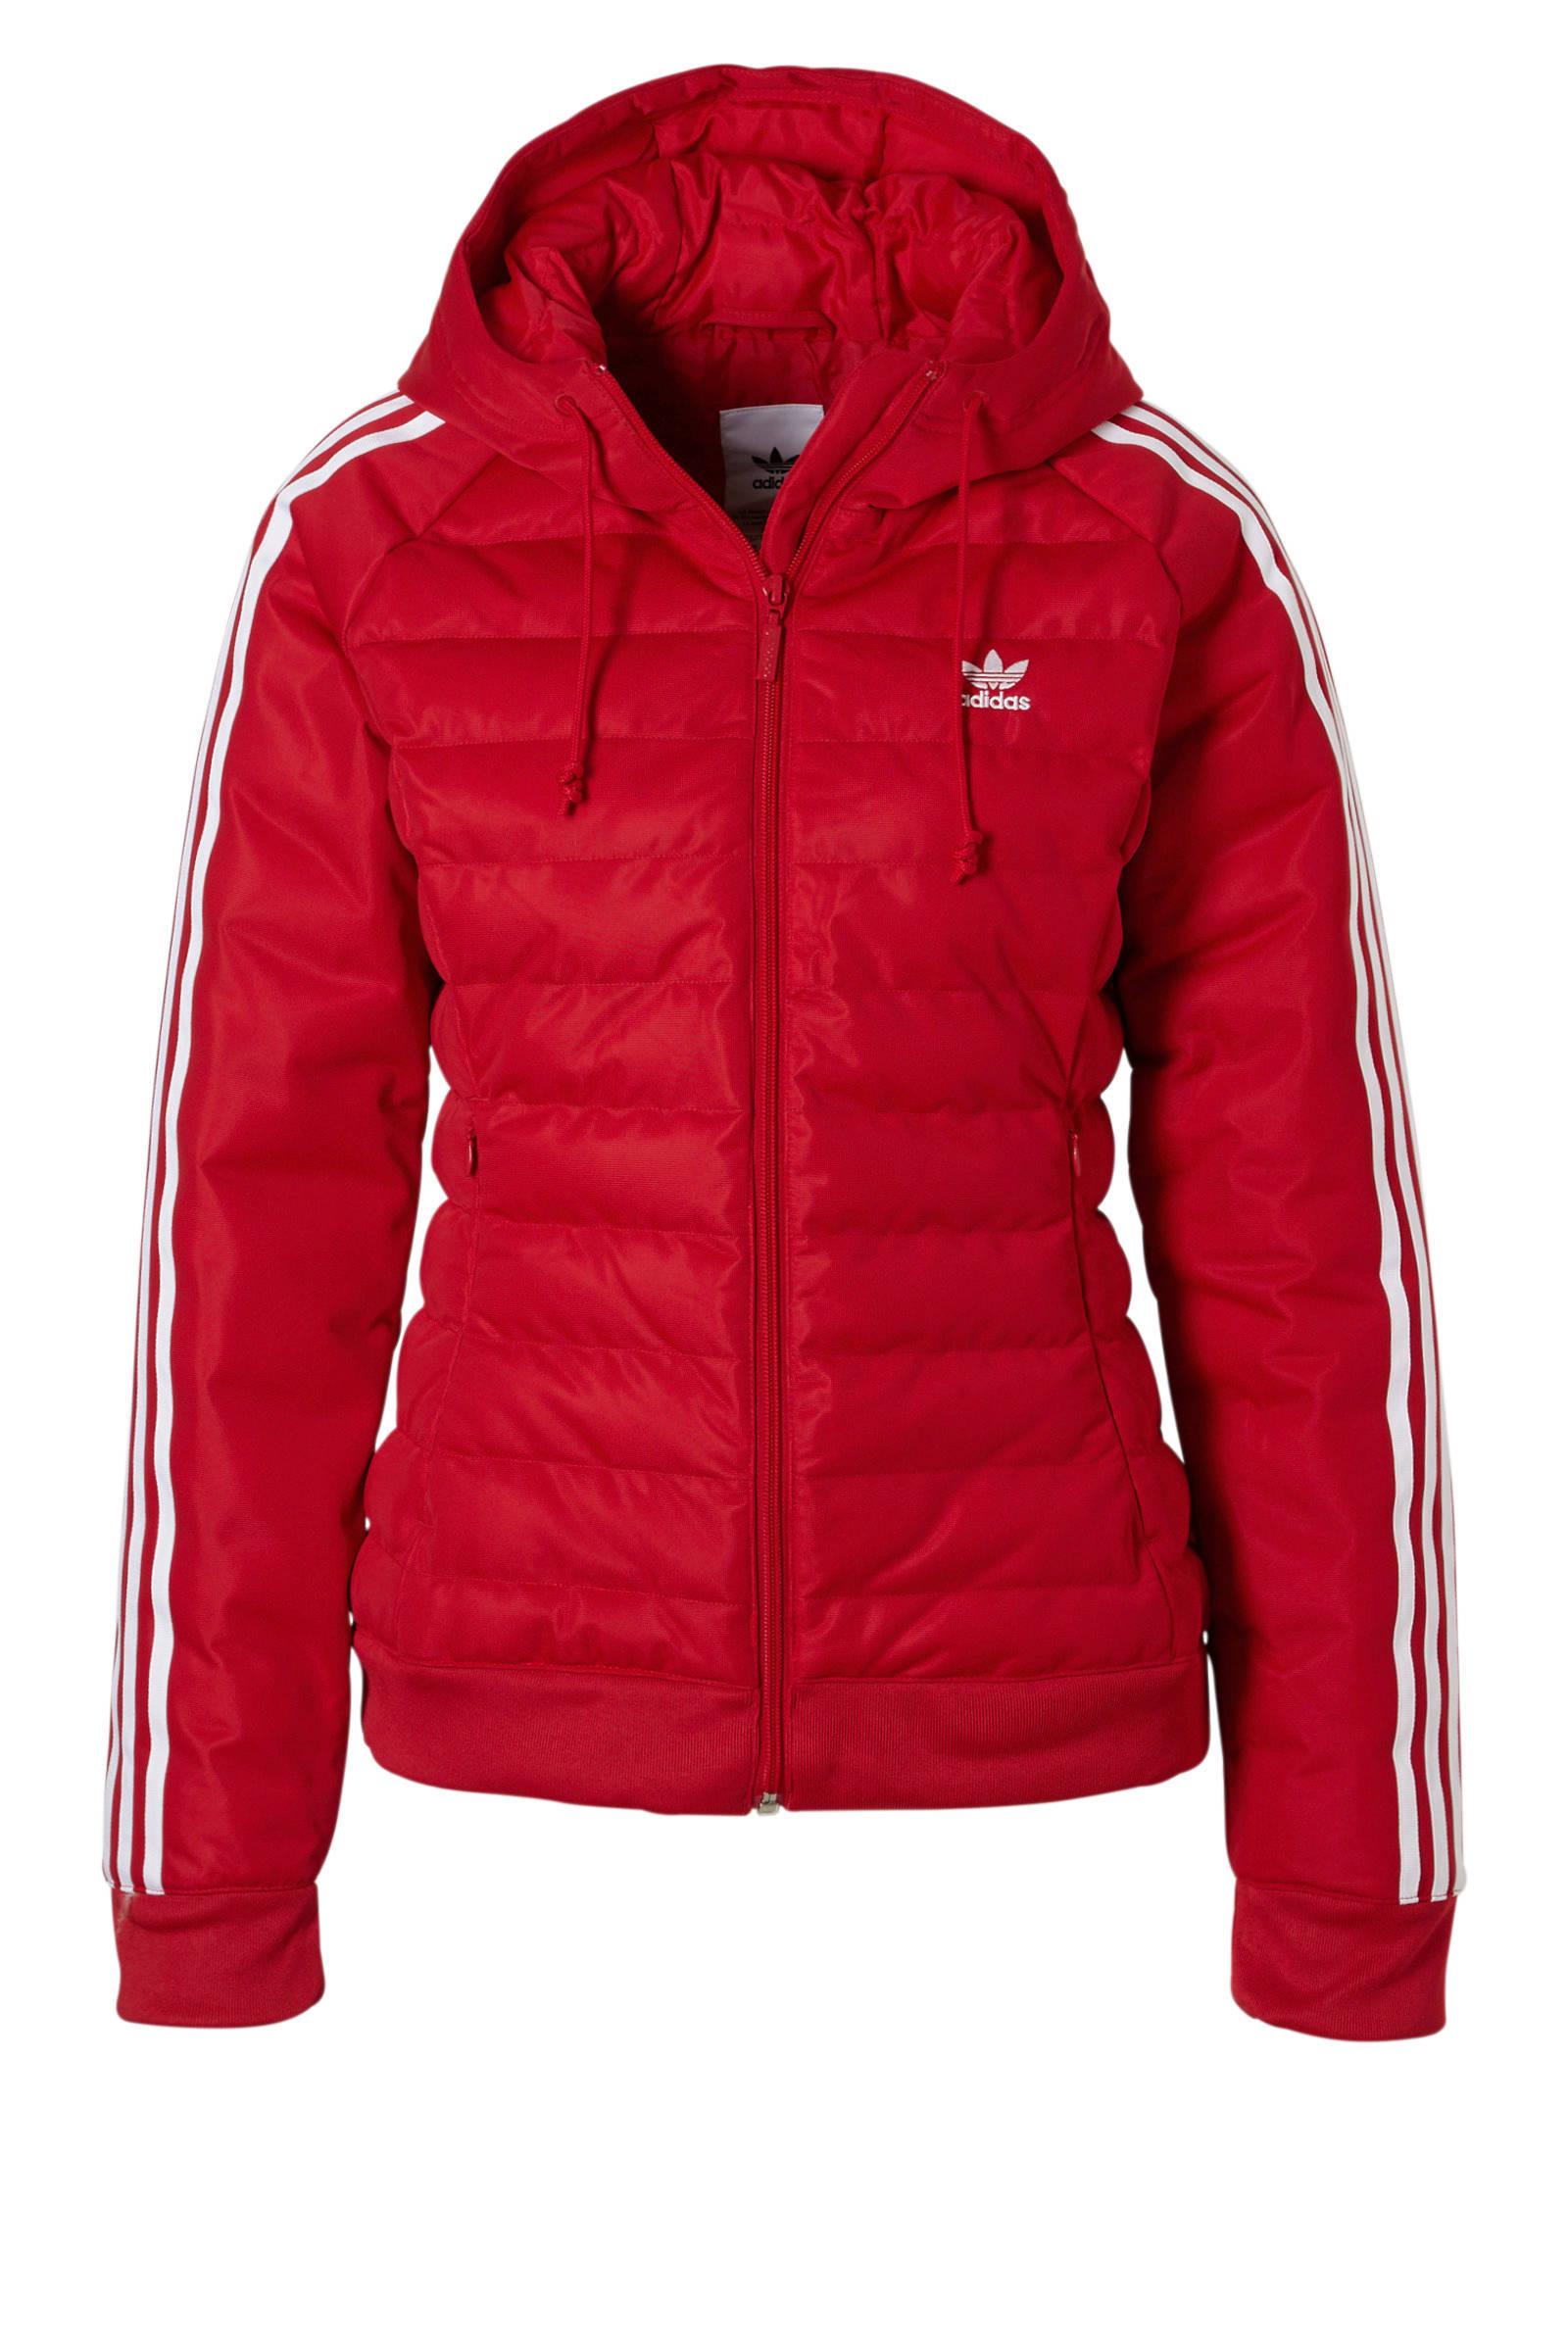 adidas Originals winterjas rood | wehkamp